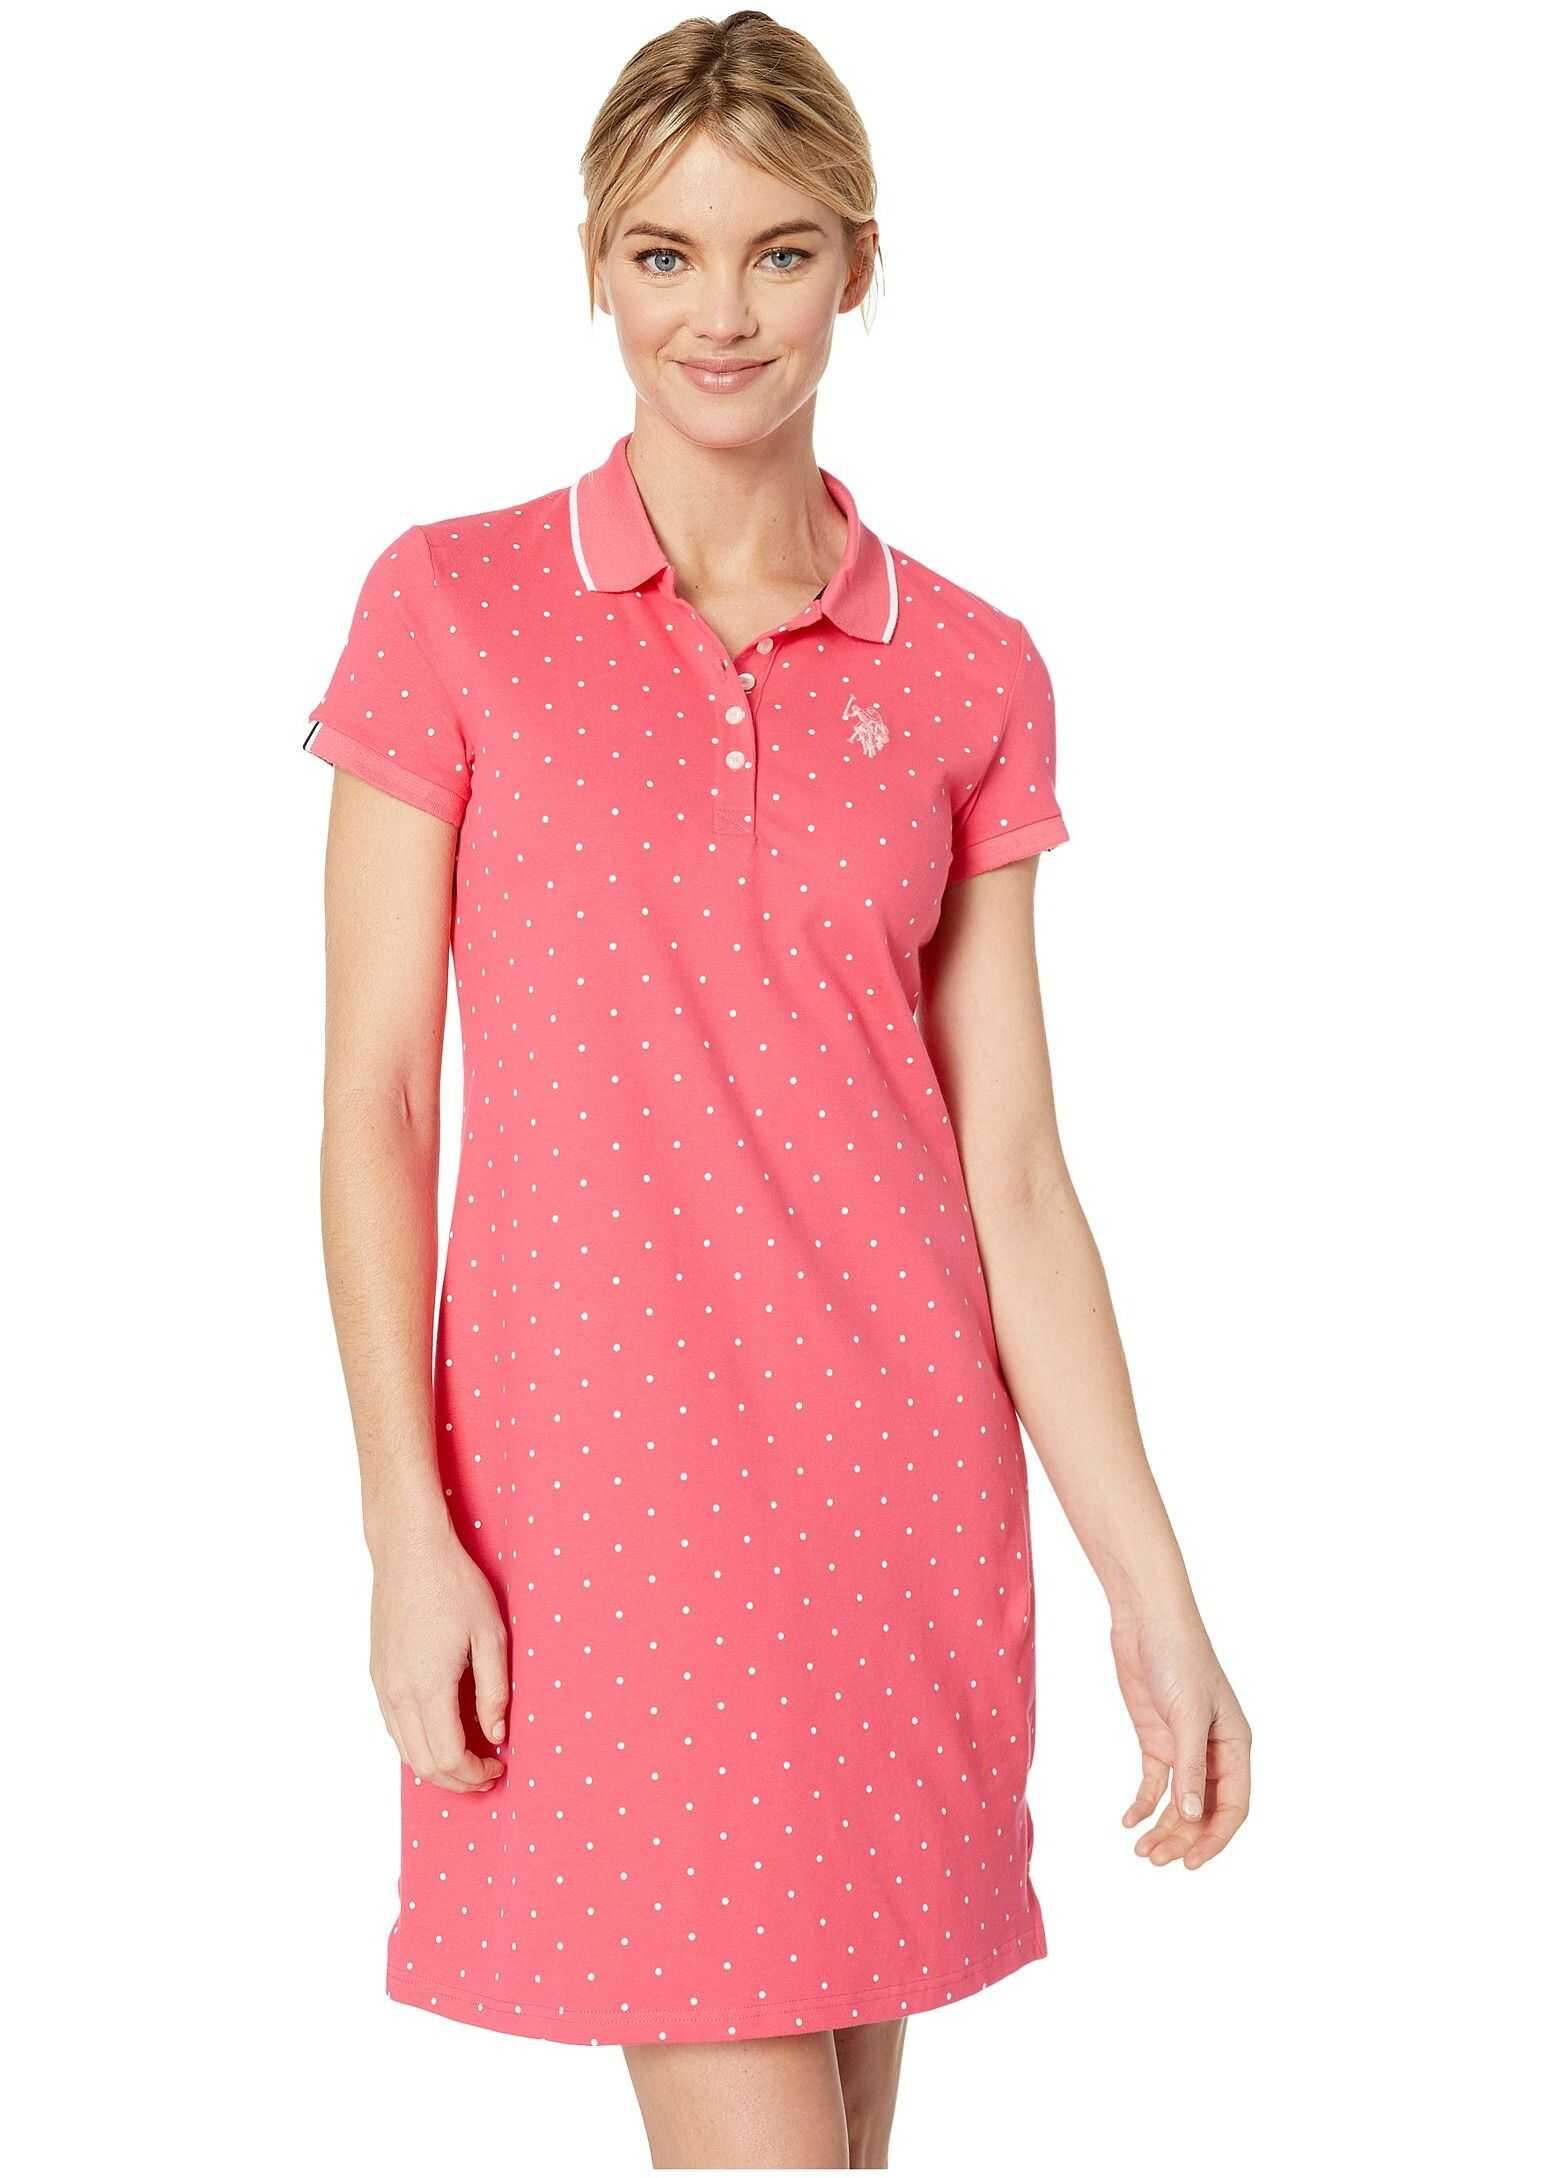 U.S. POLO ASSN. Dot Polo Dress Shangri La Rose